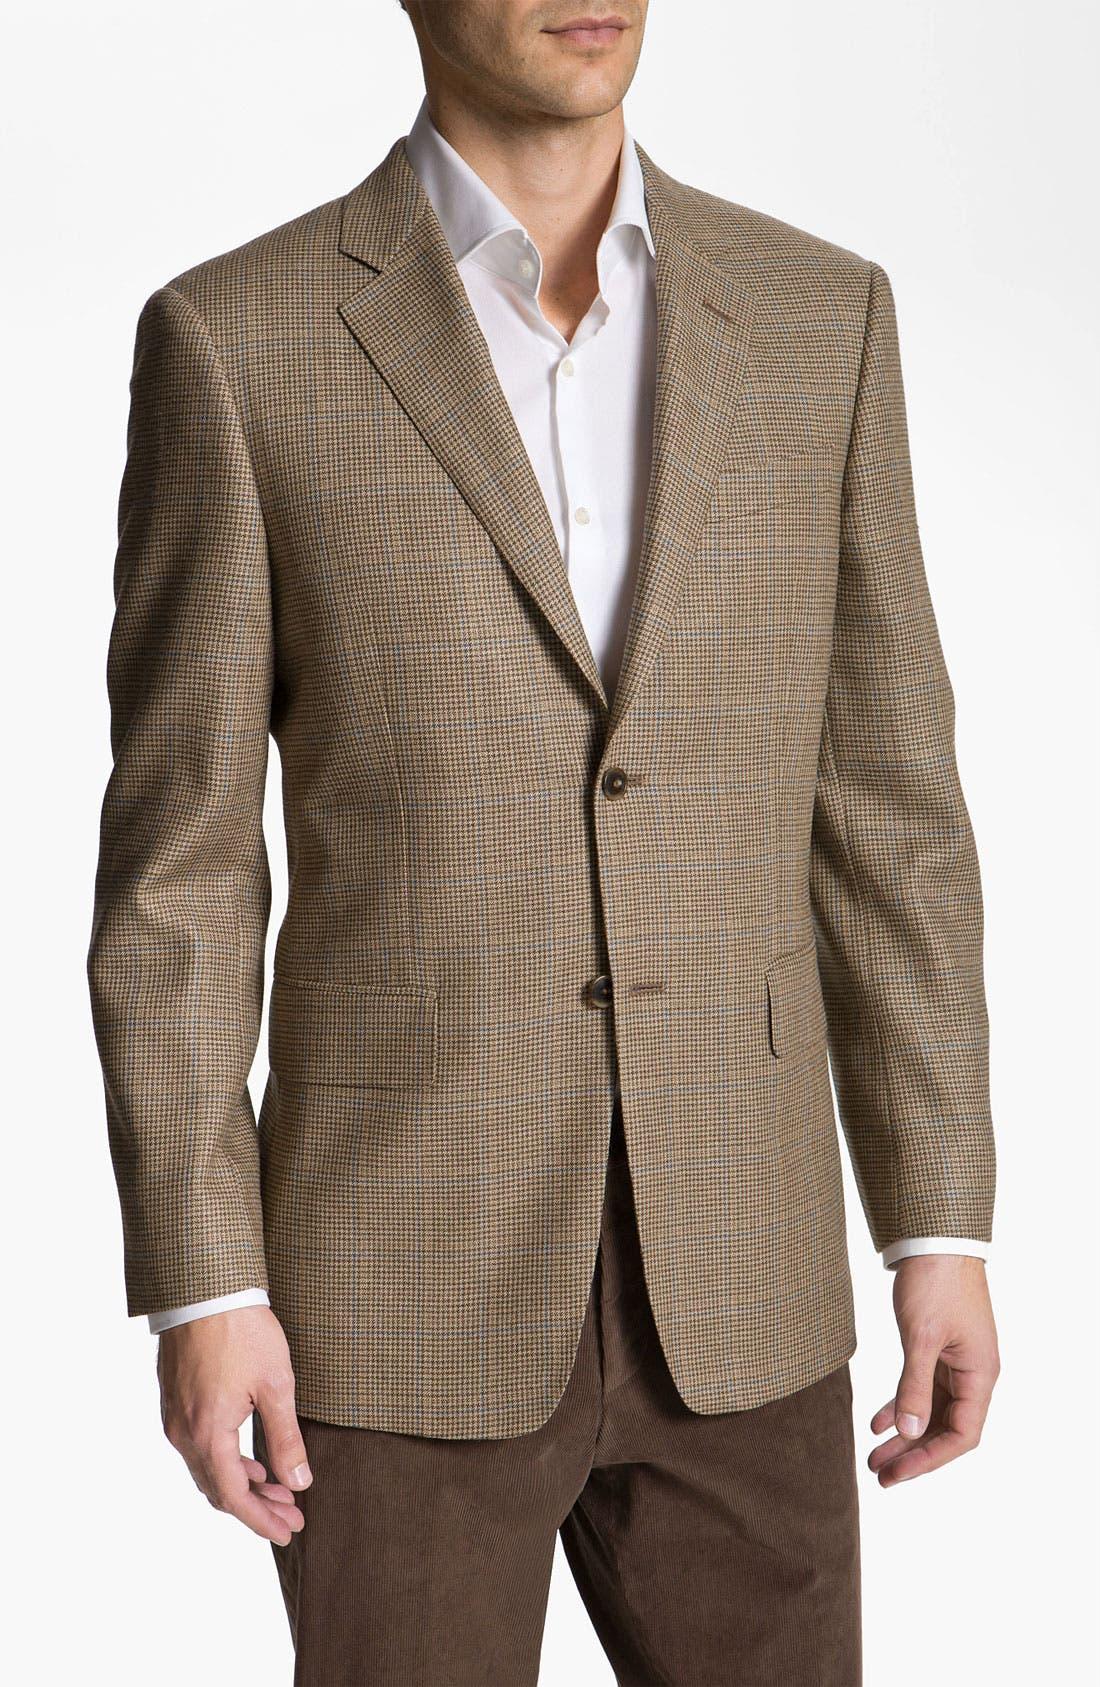 Alternate Image 1 Selected - John W. Nordstrom® Houndstooth Sportcoat